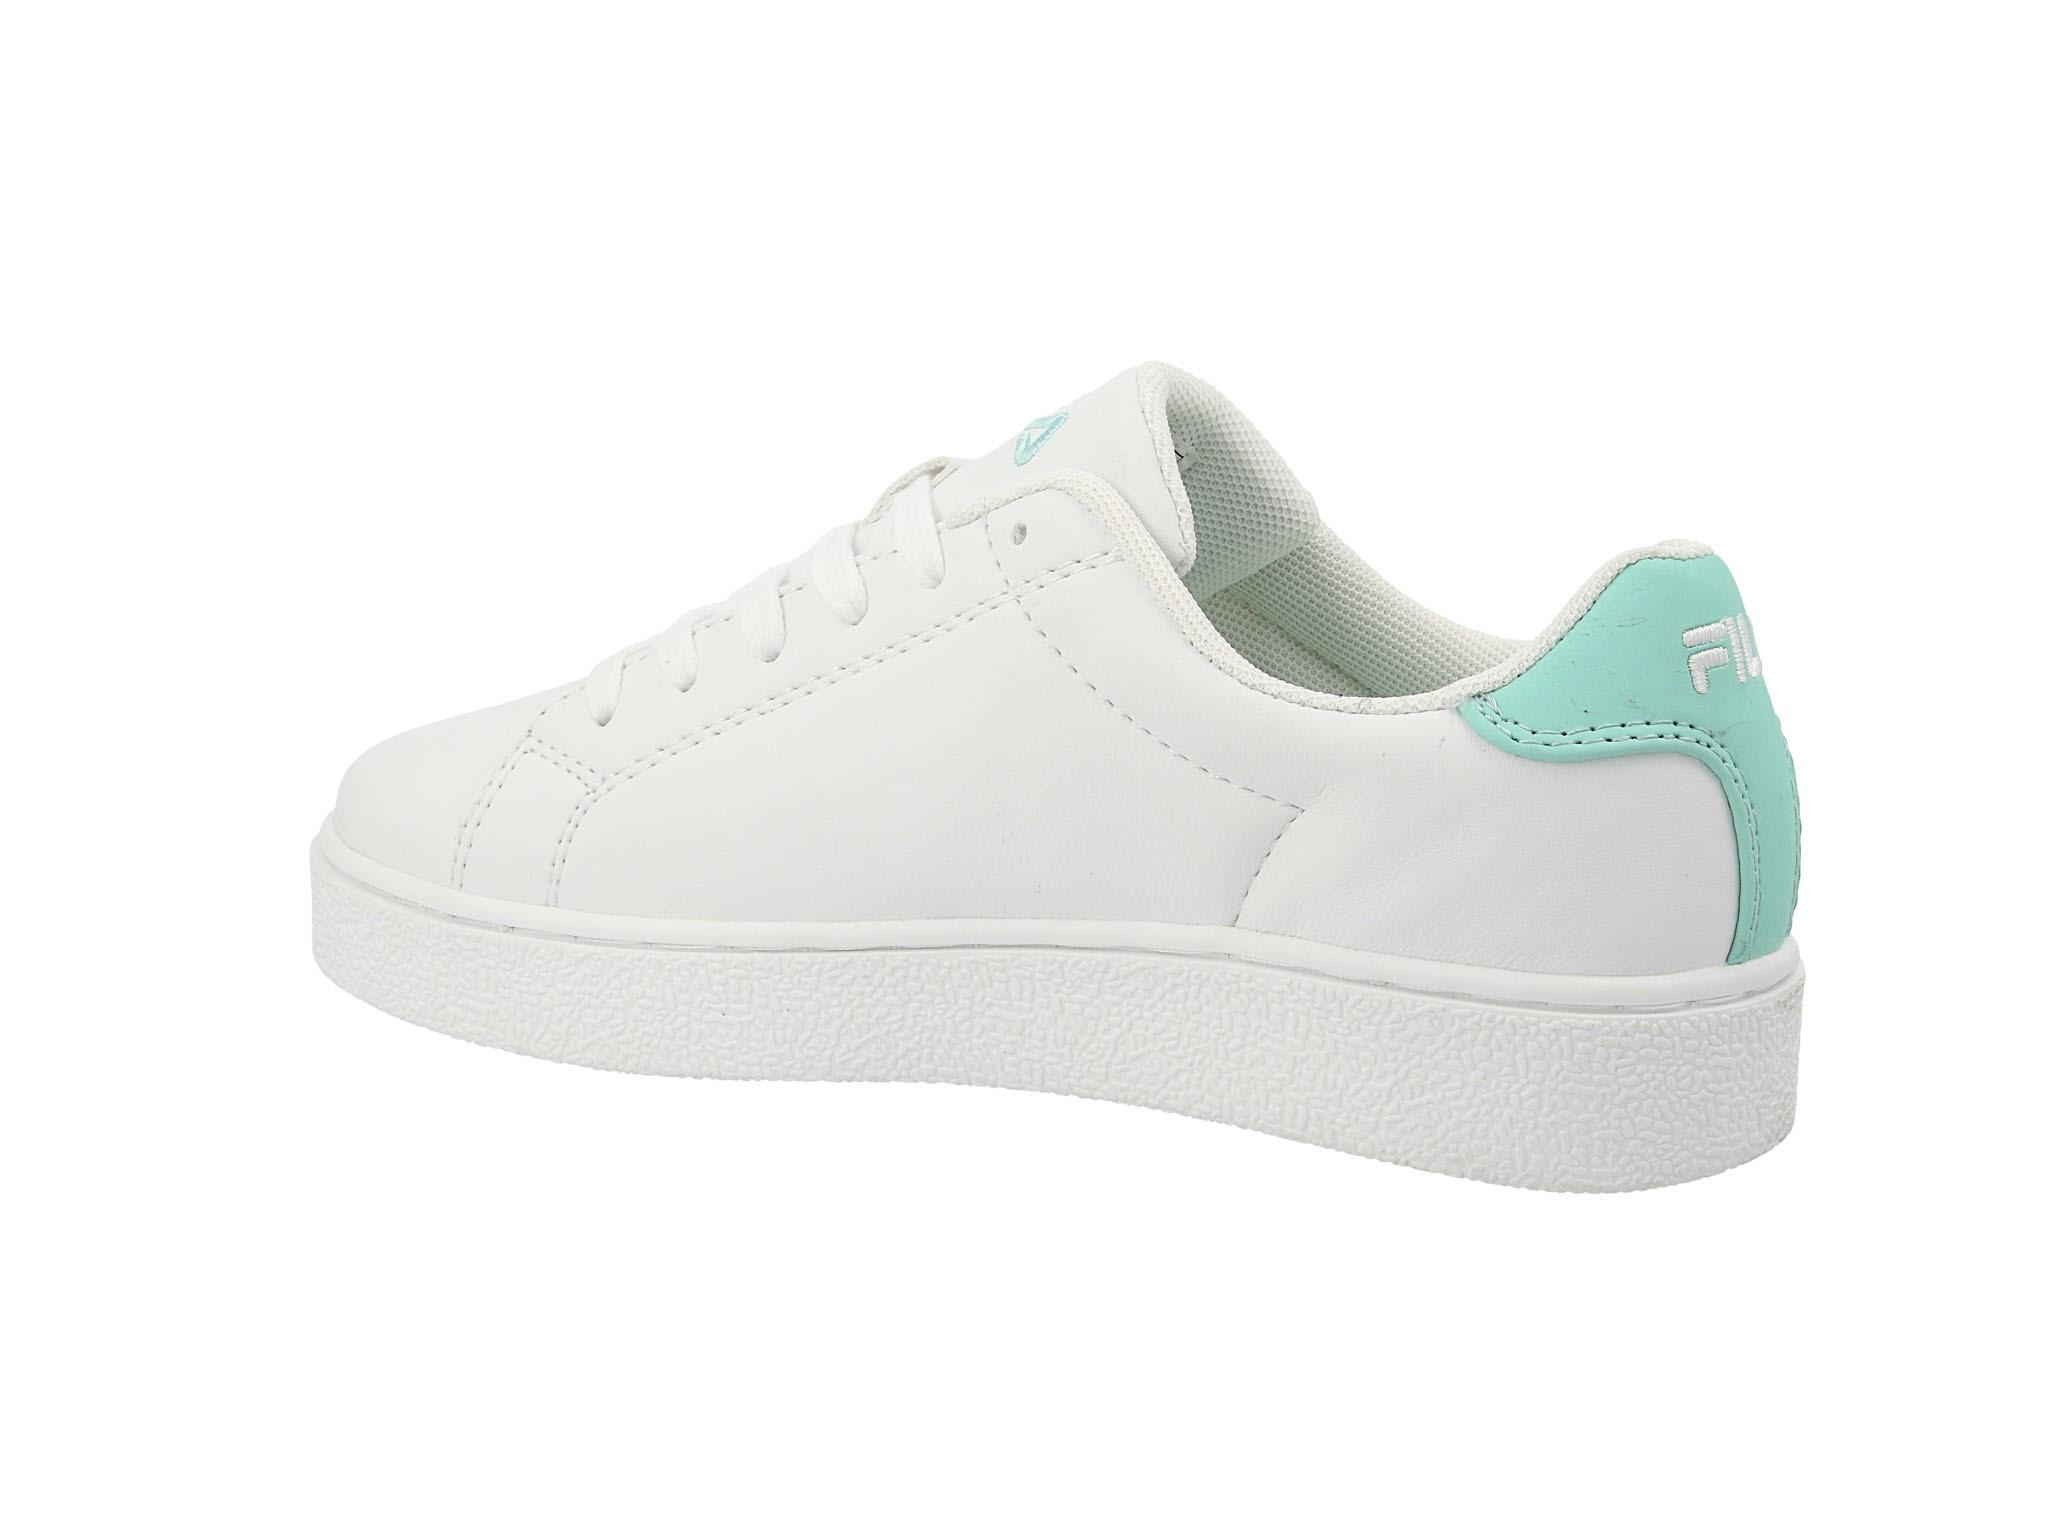 Sneakersy FILA Upastge Low Wmn 1010327.02R WhiteSoothing